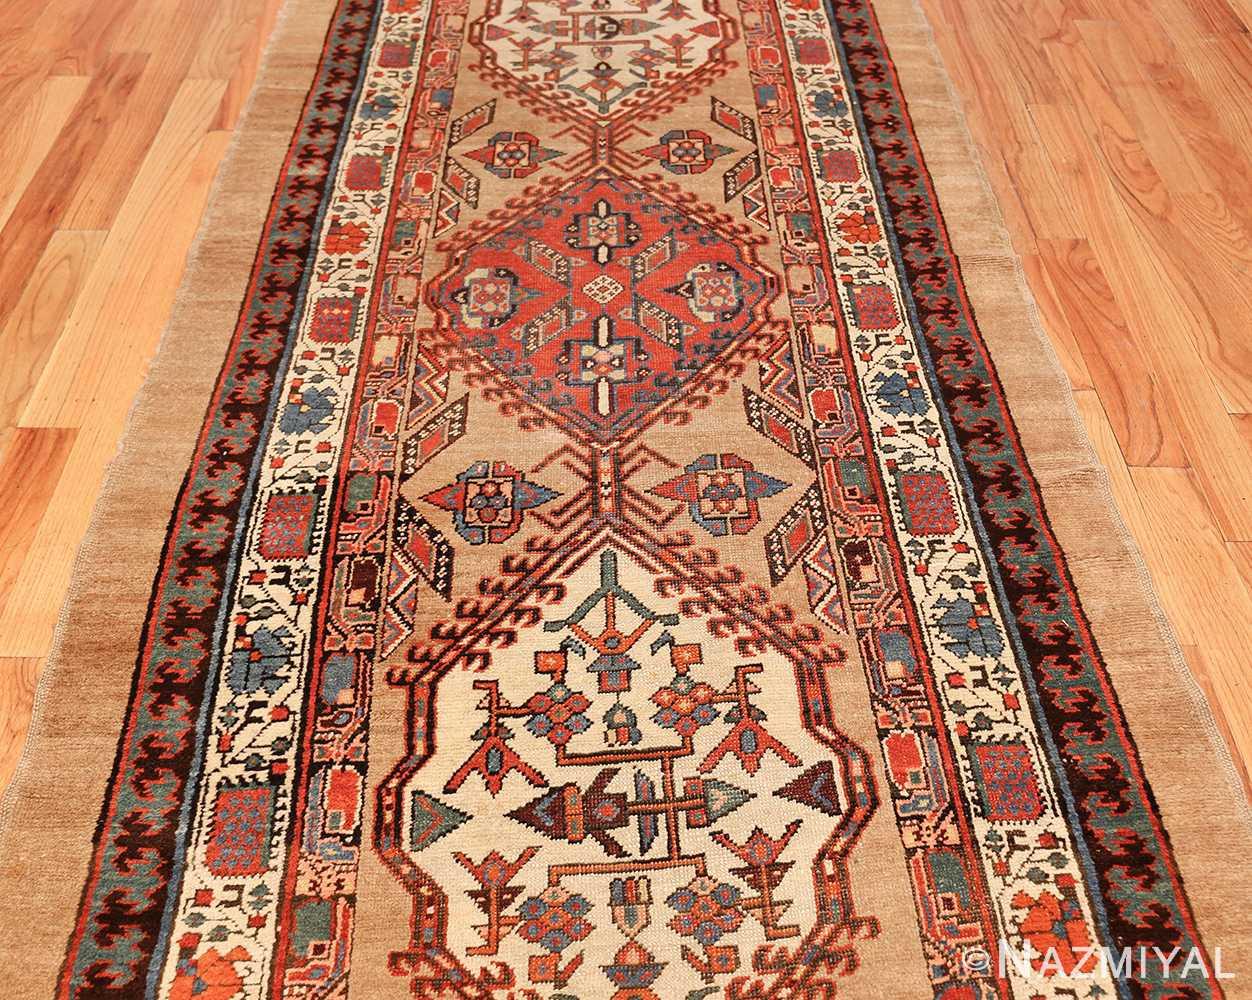 antique persian serab runner rug 48242 field Nazmiyal